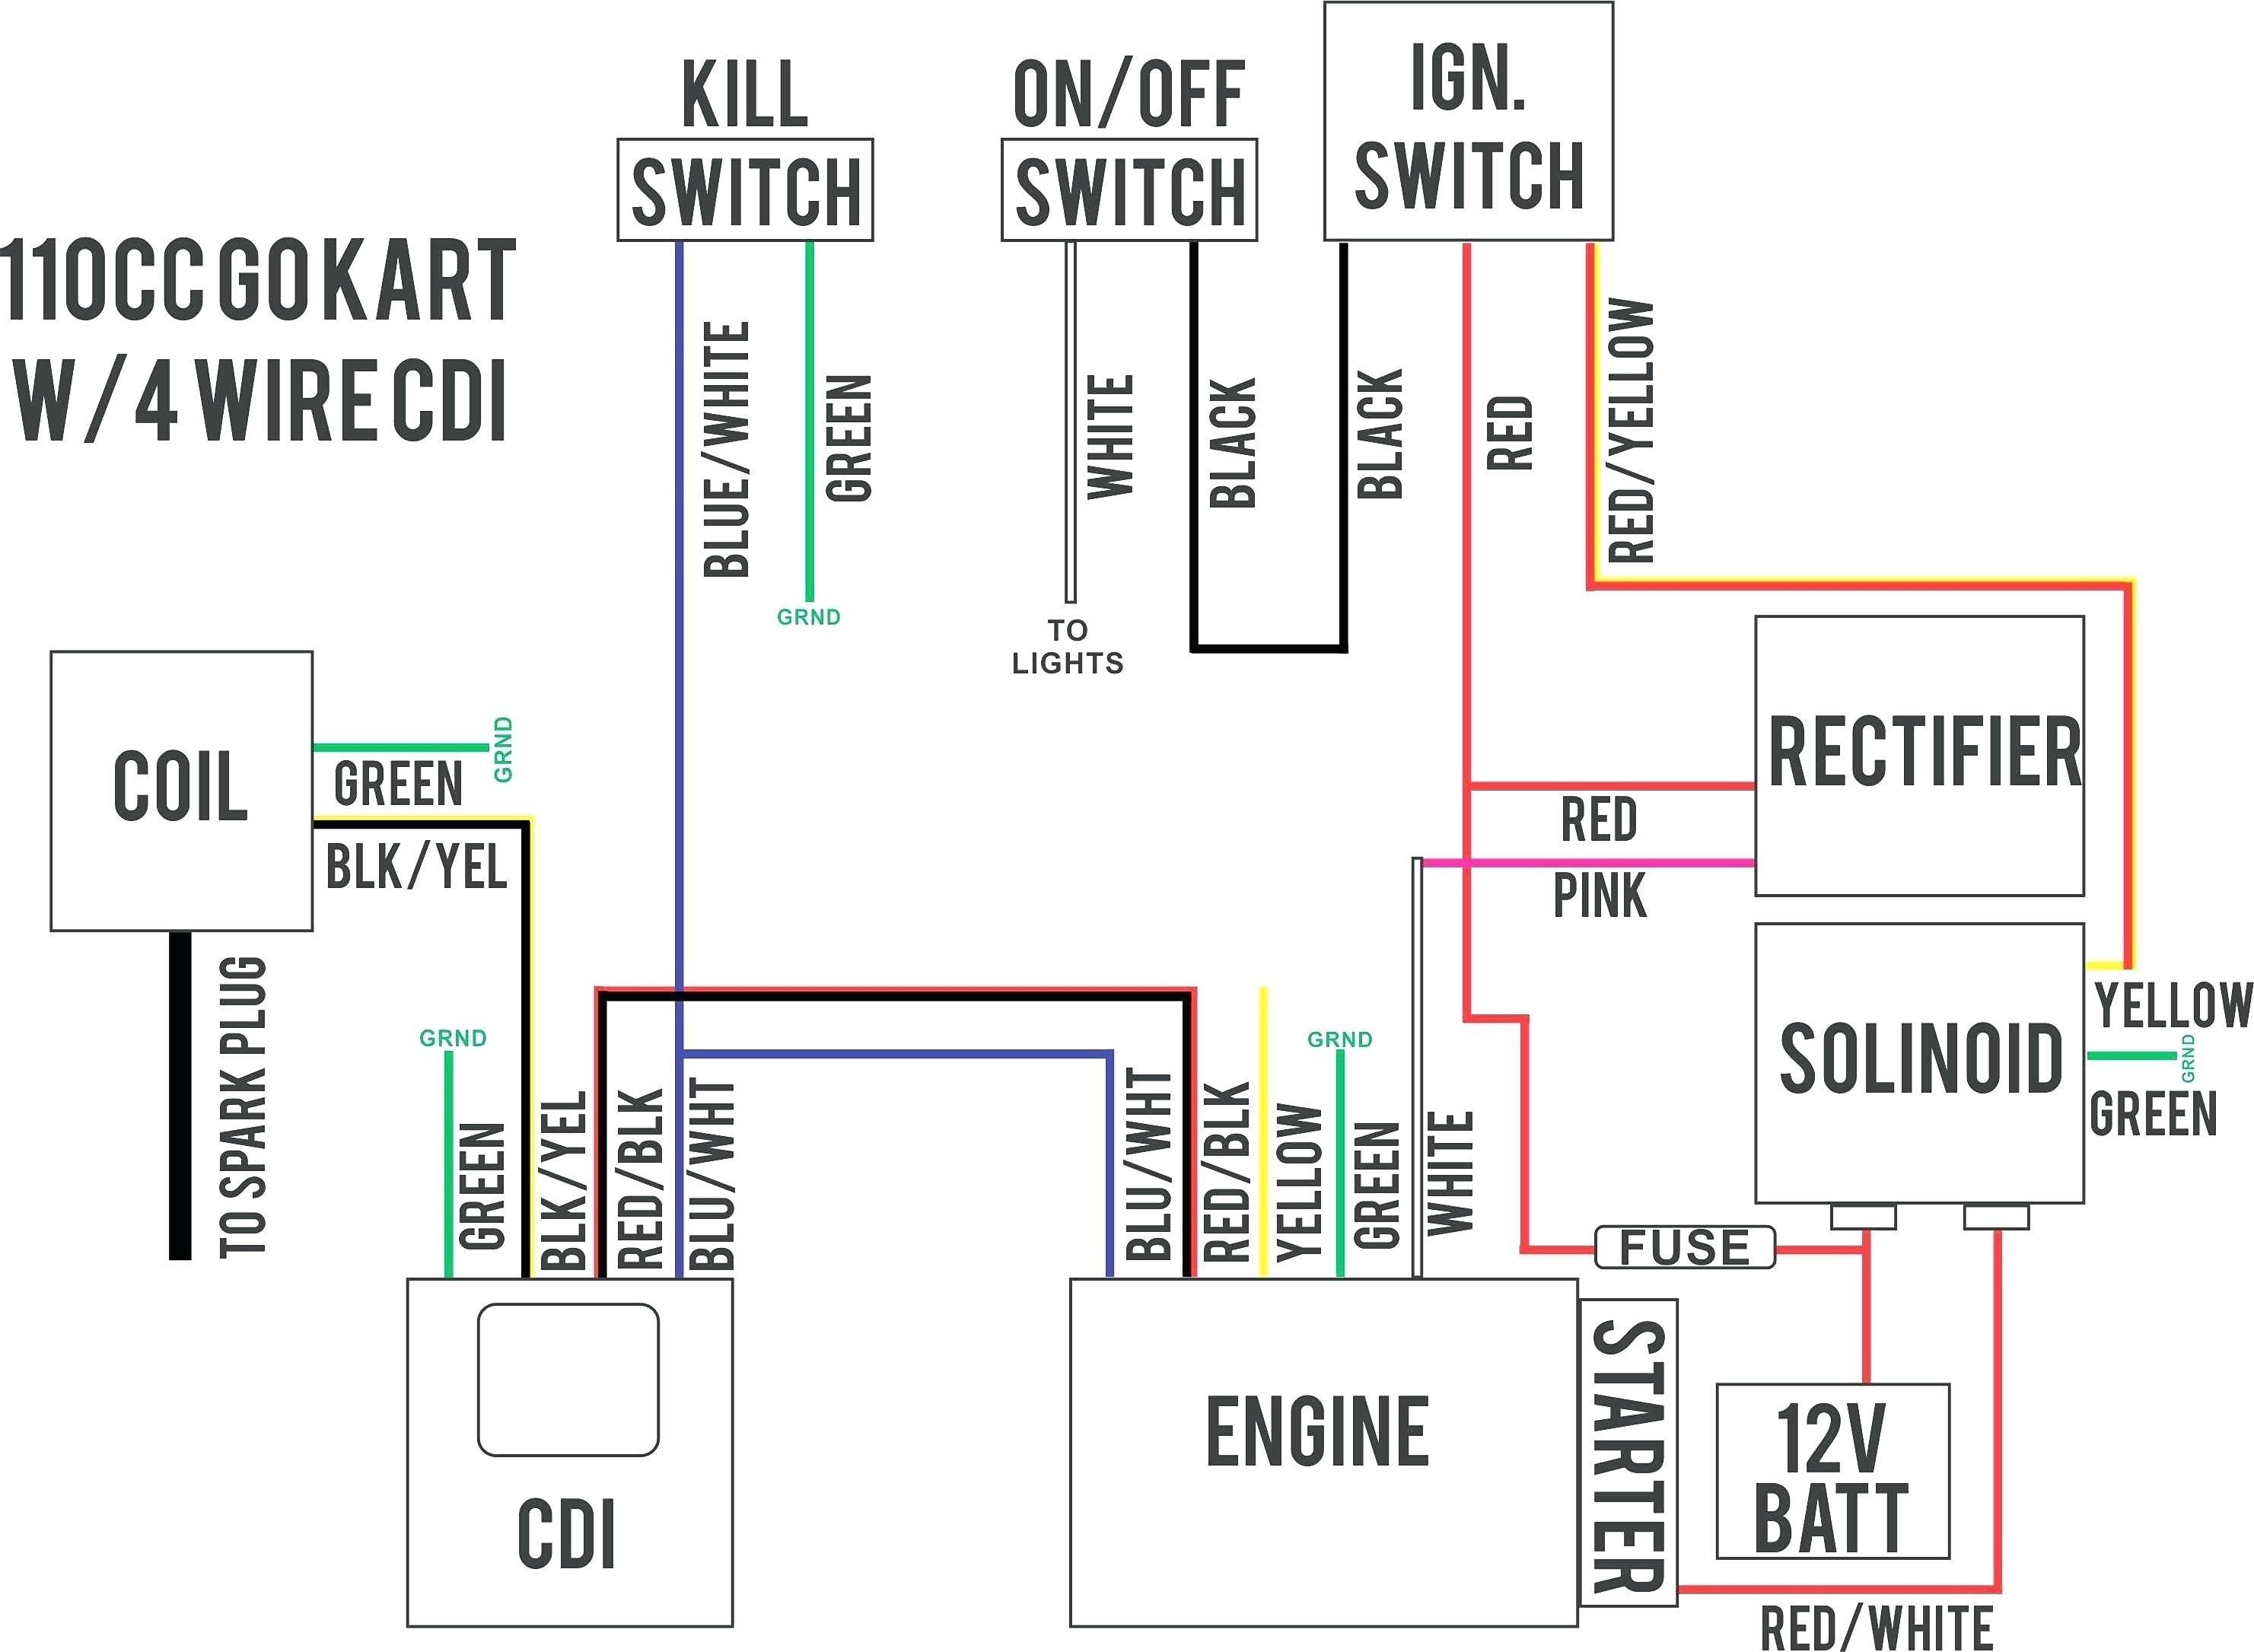 portable generator wiring schematic 18 bnm savic family de \u2022 Honda Generators Wiring Schematics generac generator wiring diagram model 0059430 wiring diagram rh tirstleonard ch generac portable generator wiring schematic wiring generator to home